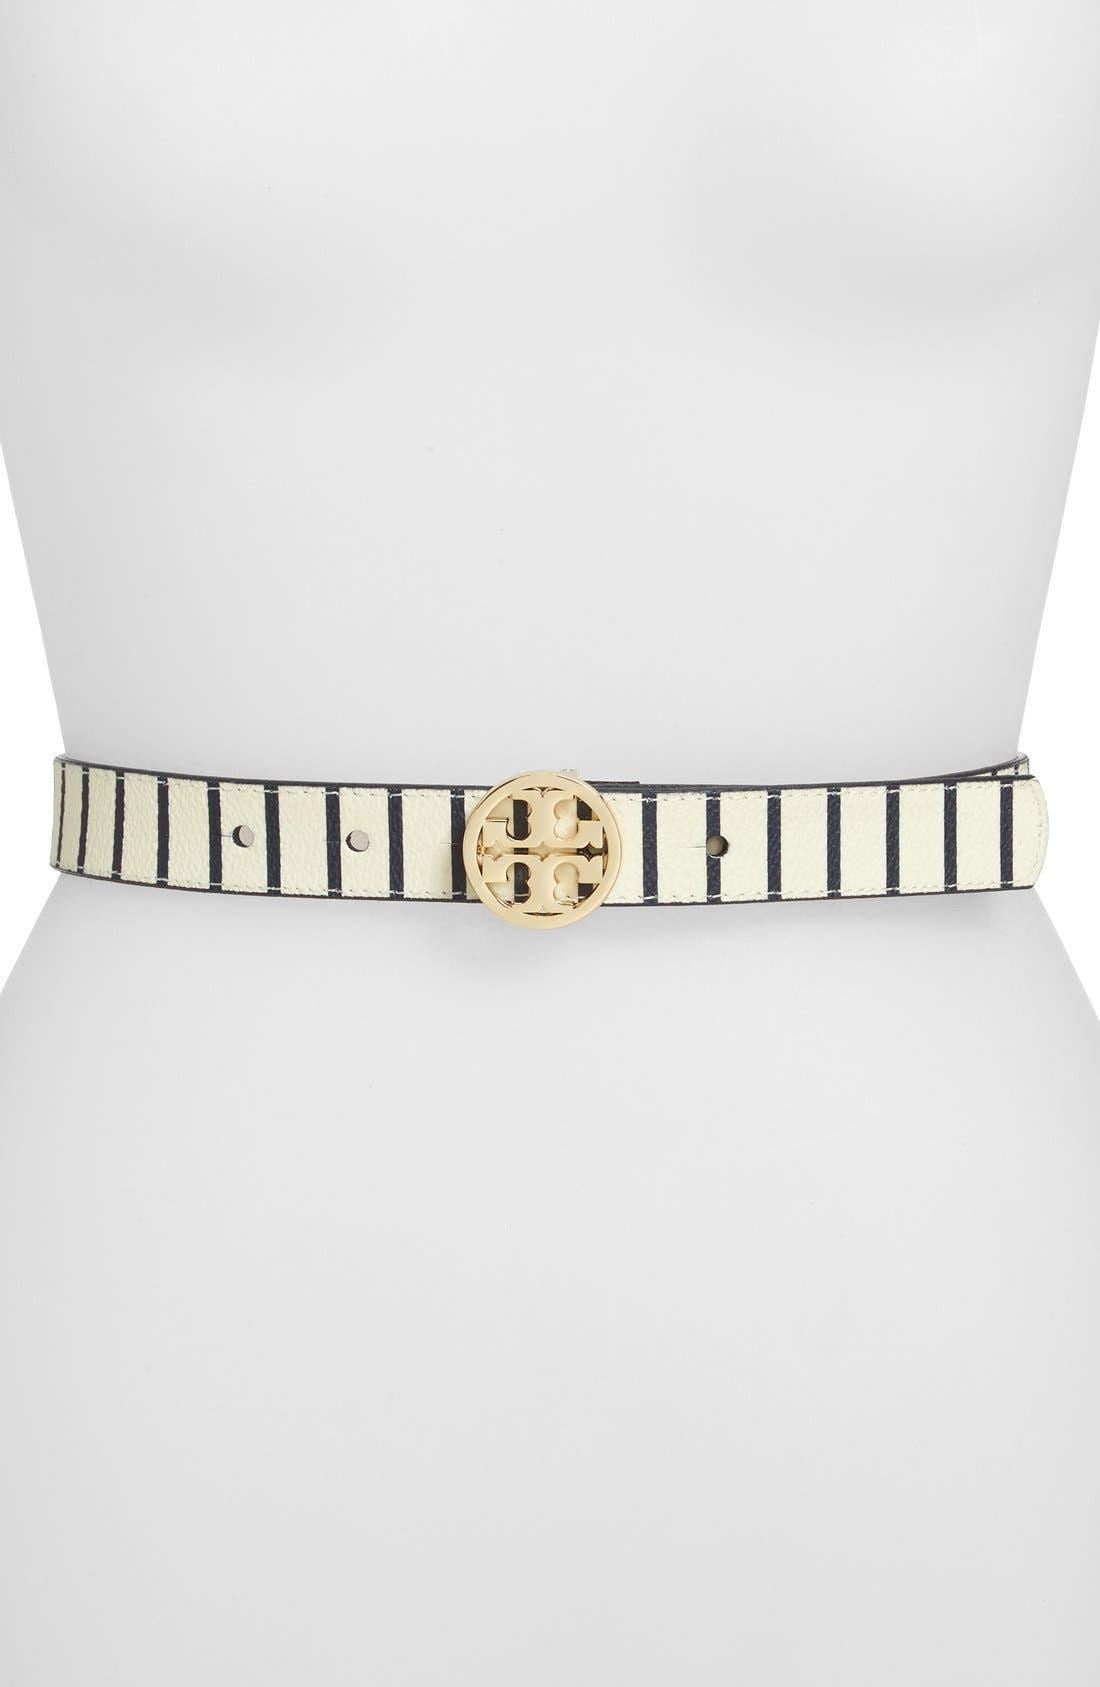 Alternate Image 1 Selected - Tory Burch 'Fleet Stripe' Leather Belt